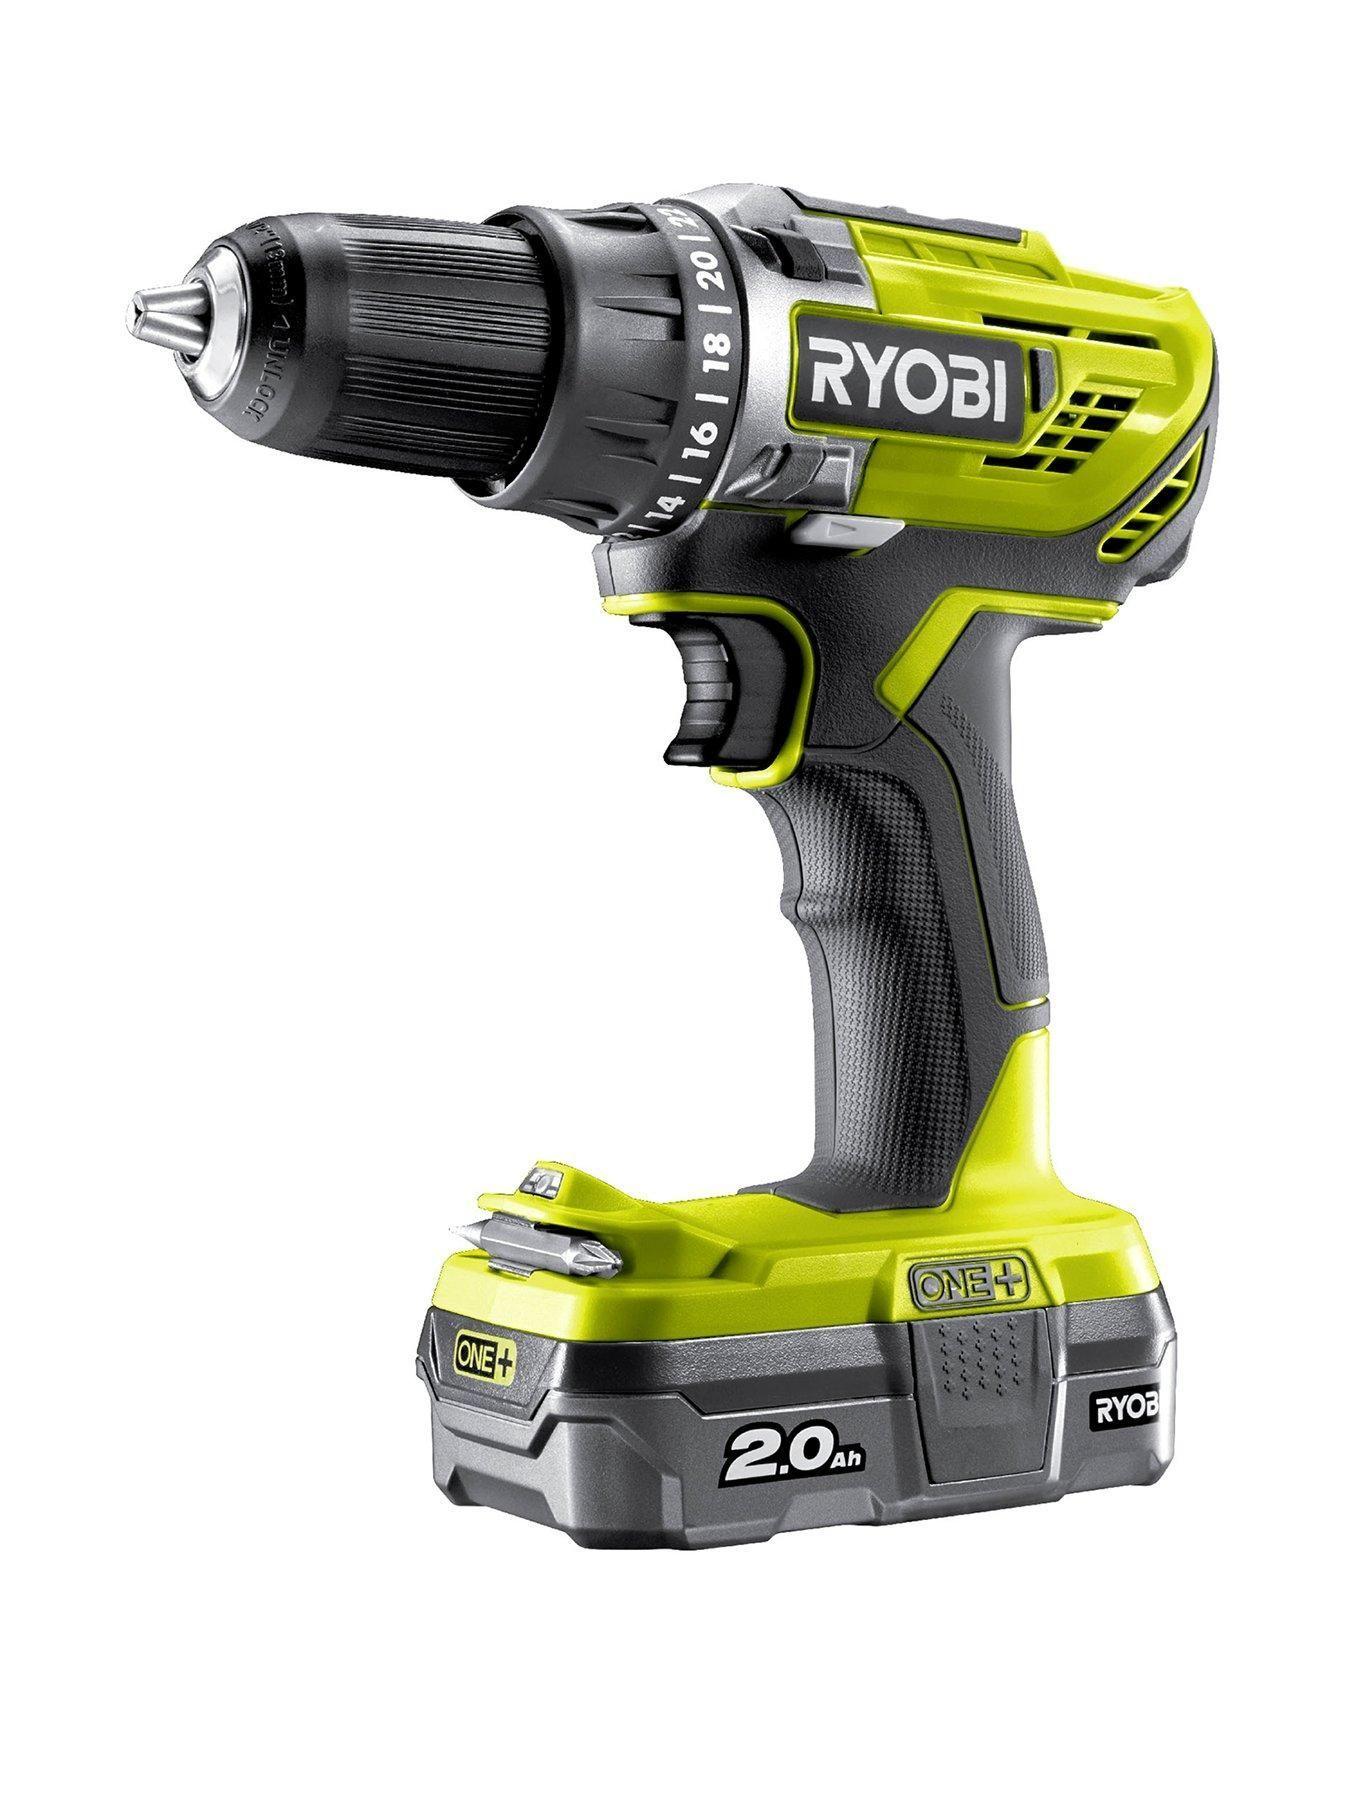 Ryobi R18dd3 120s 18v One Cordless Drill Driver Starter Kit 1 X 2 0ah In One Colour Dekoration Schlafzimmer Wohnzimmer Drill Driver Cordless Drill Drill